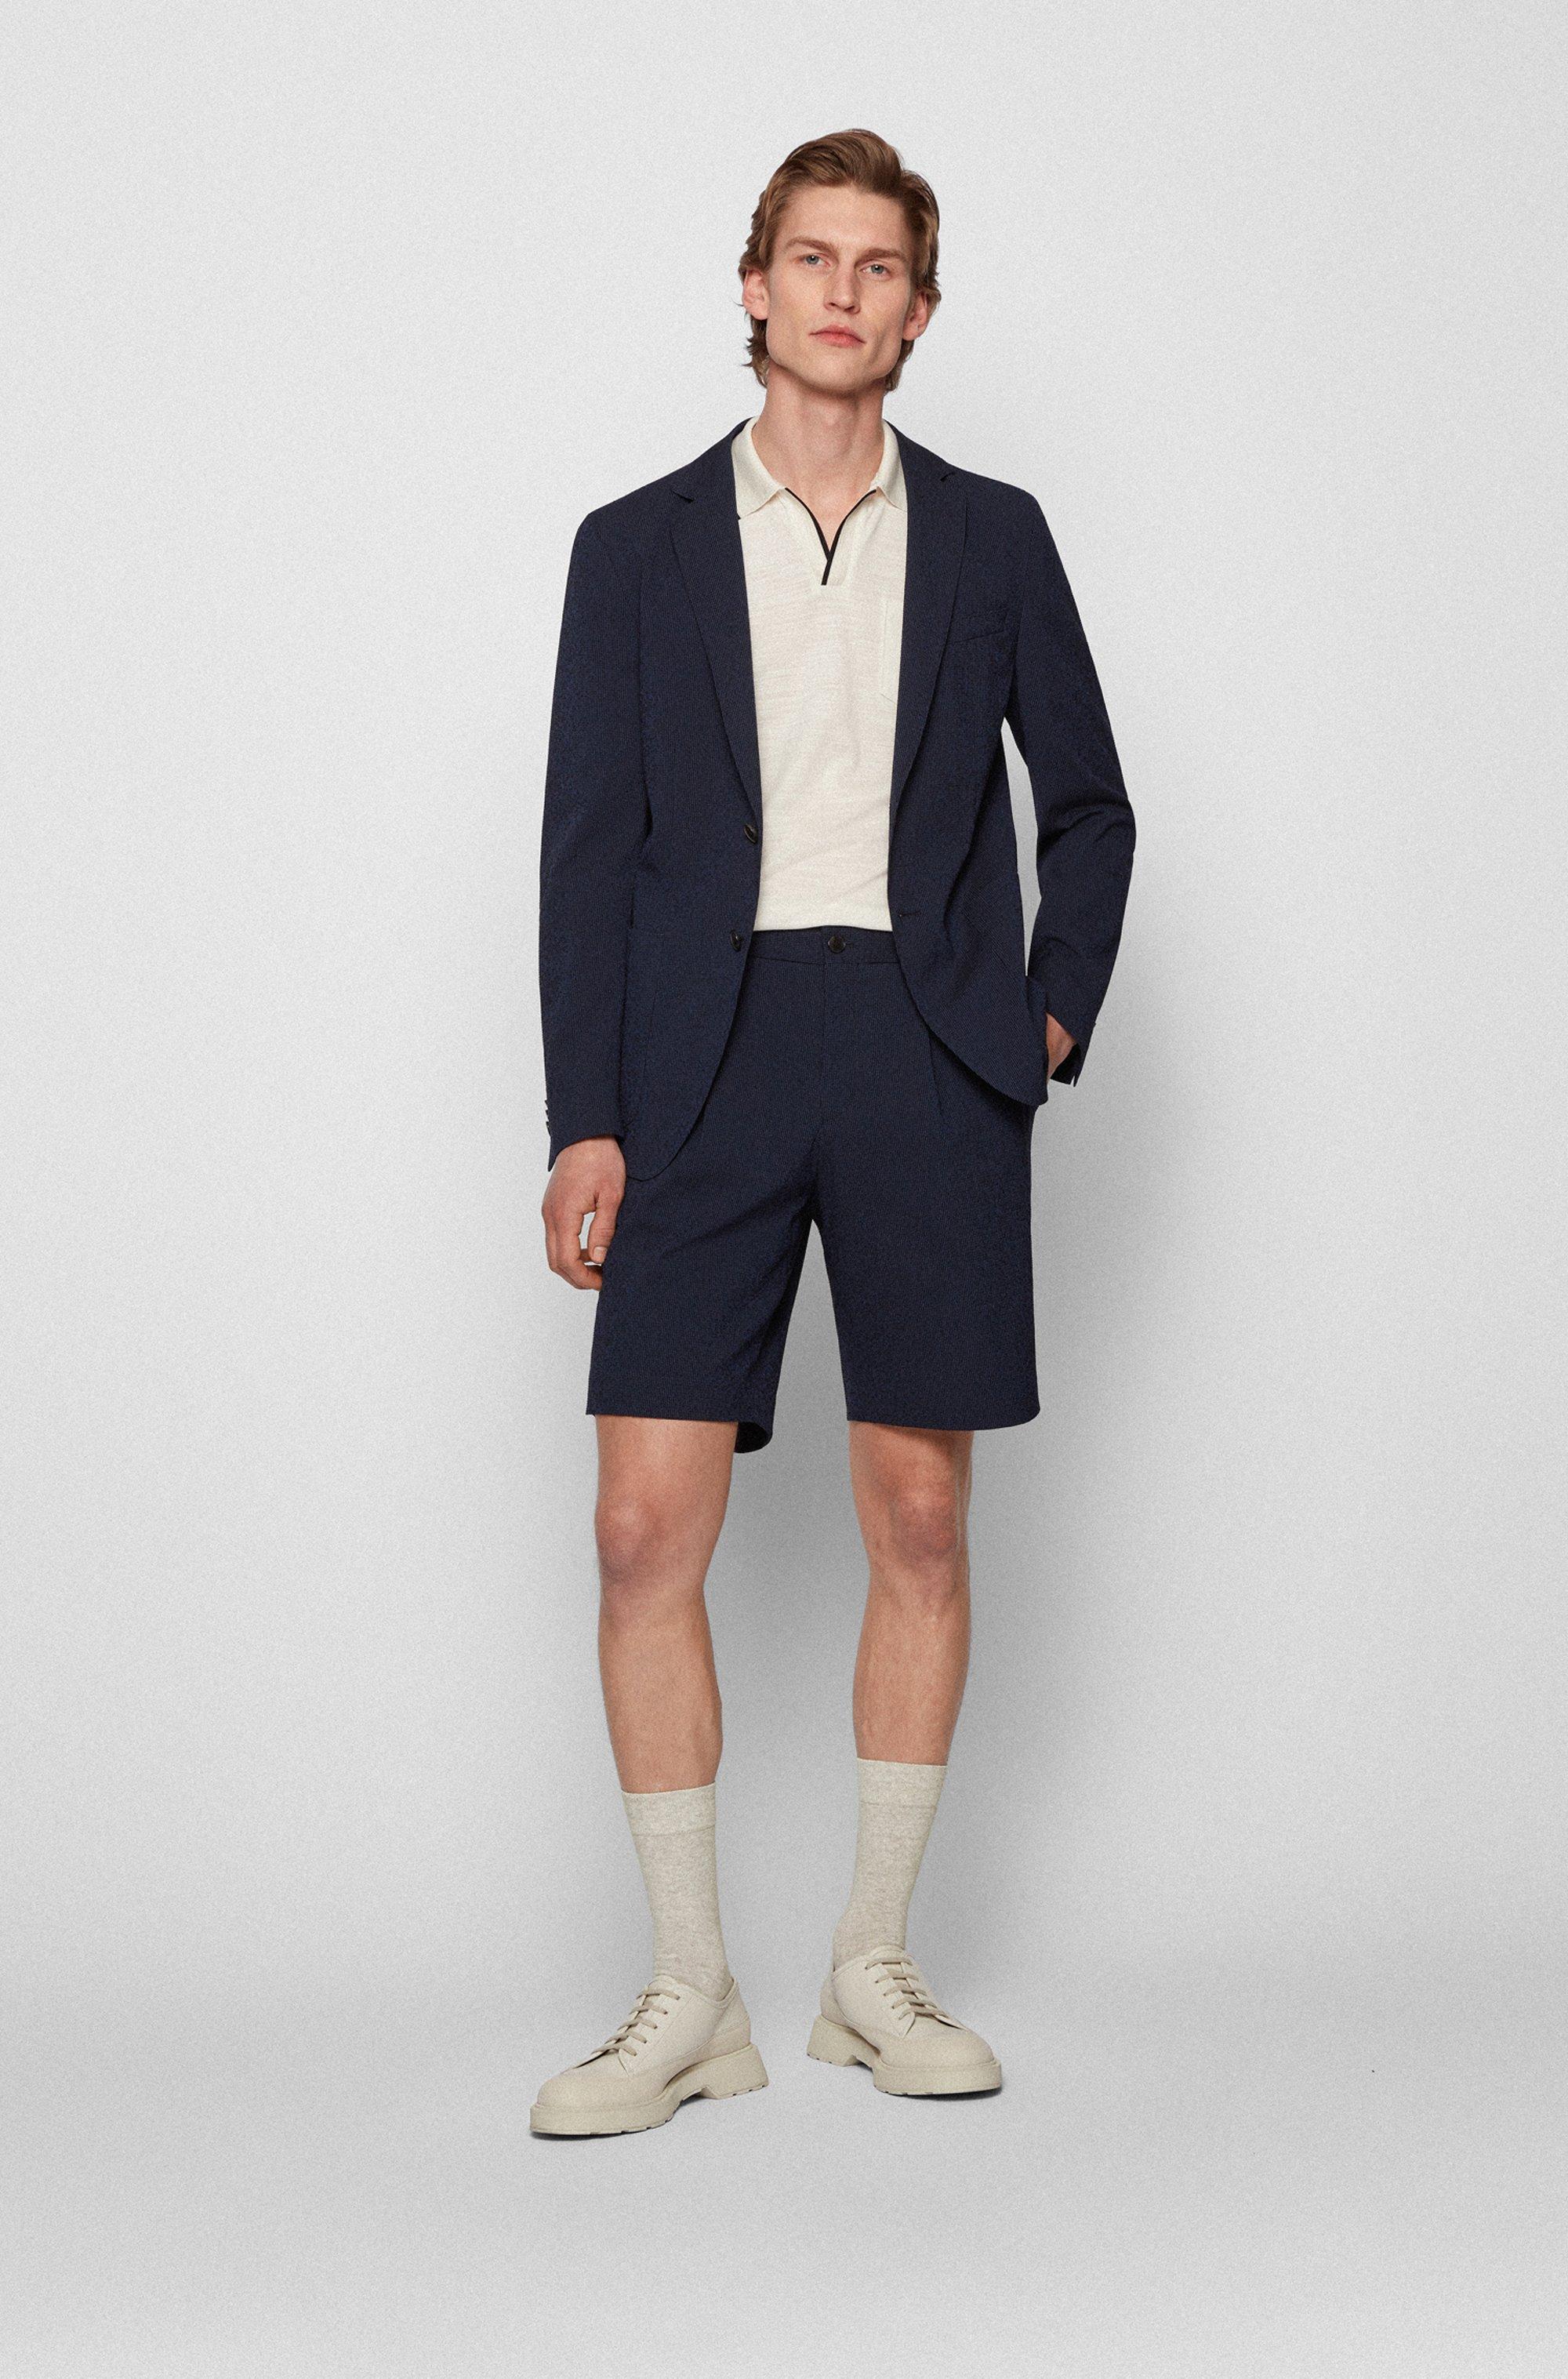 Slim-fit jacket in a cotton-blend seersucker